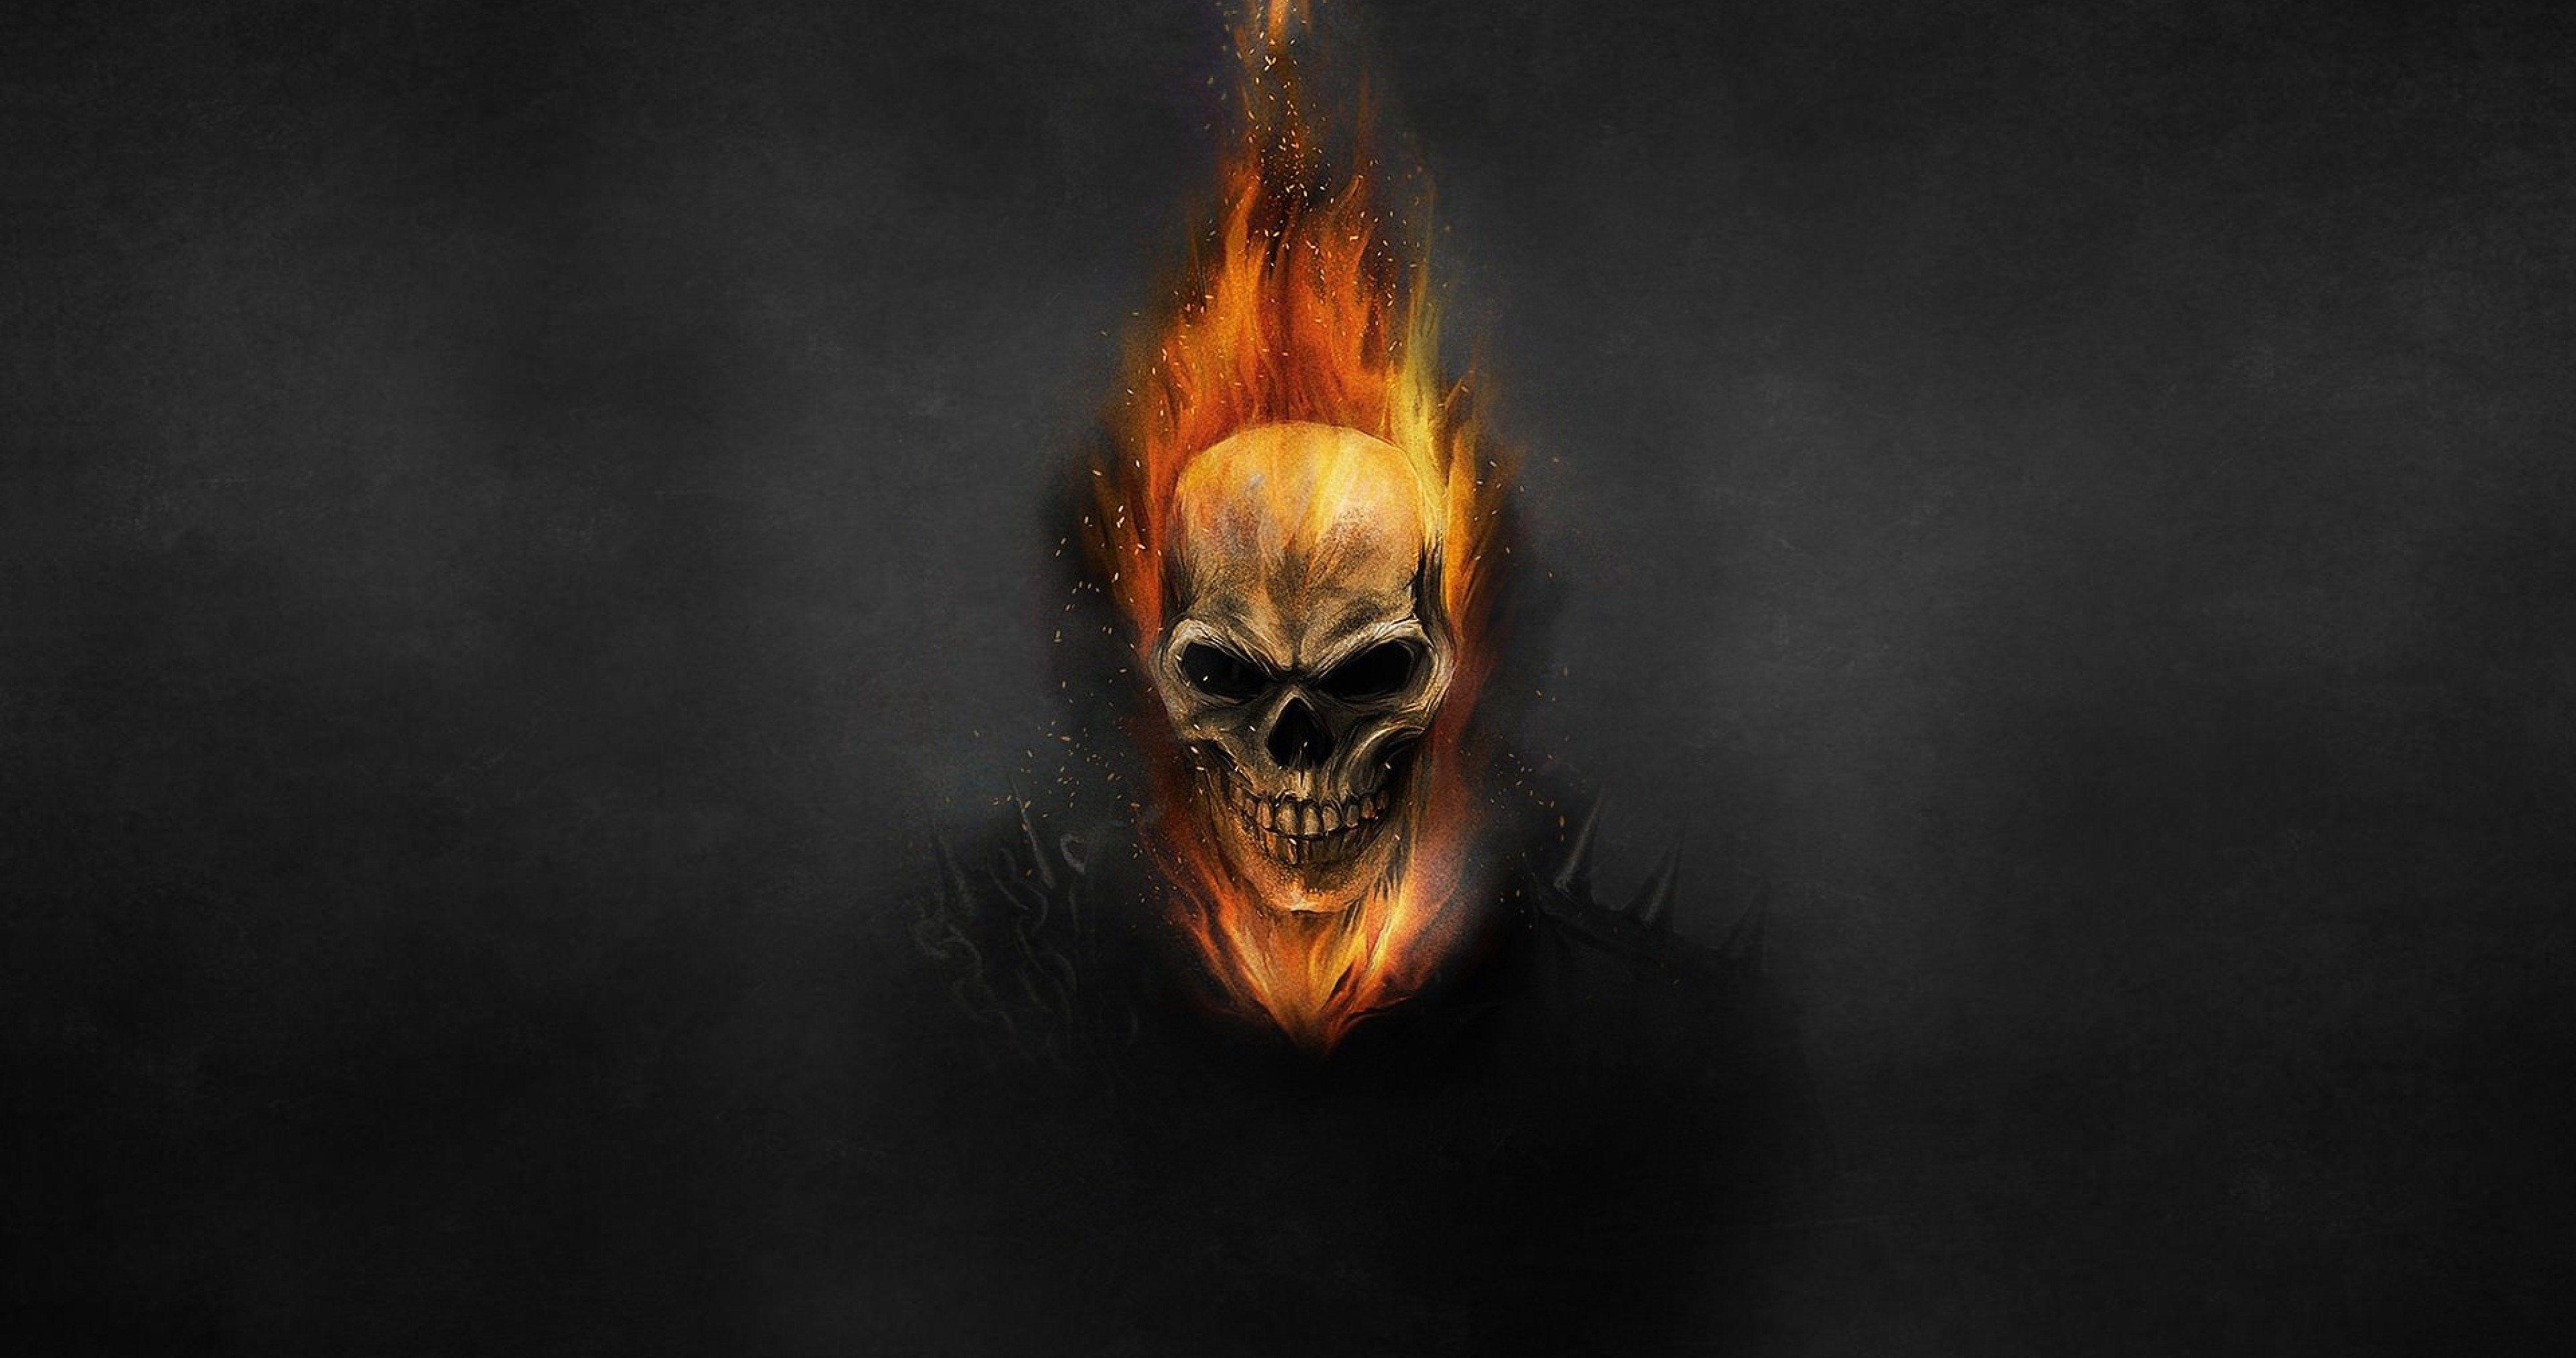 Ghost Rider Skeleton 4k Ultra Hd Wallpaper Ghost Rider Wallpaper Ghost Rider Skull Wallpaper